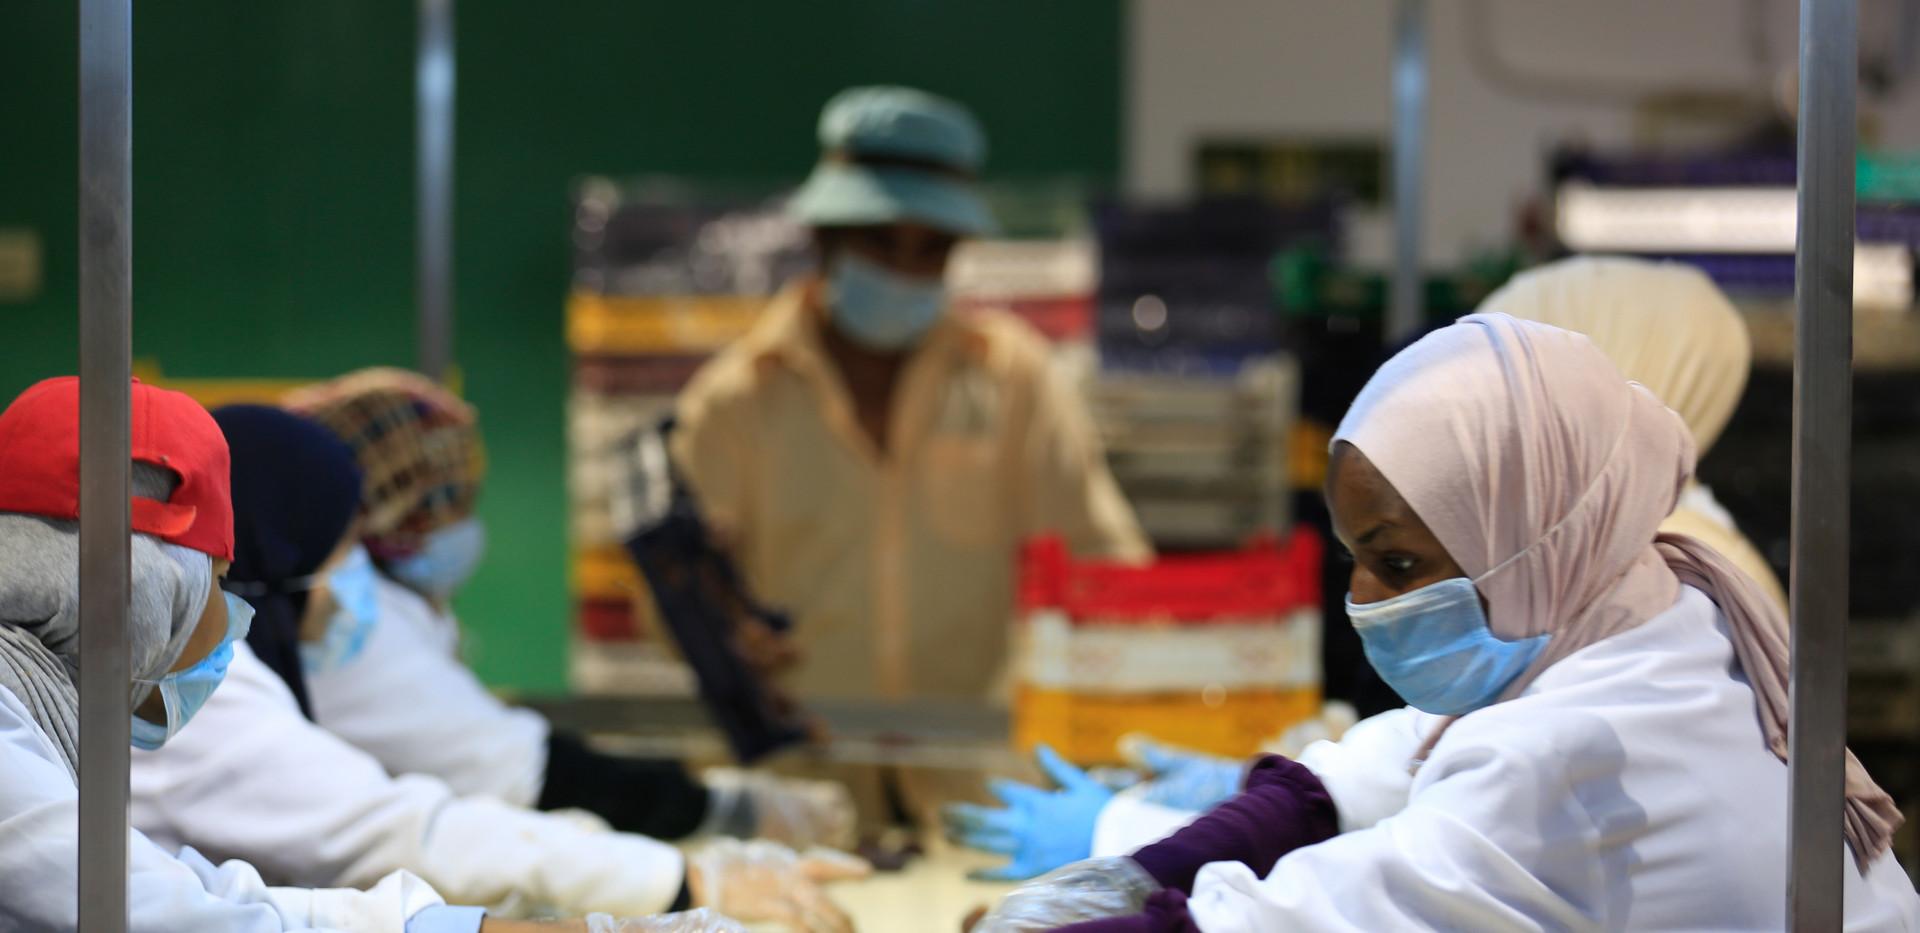 proccessing finest dates in tamara farms factory